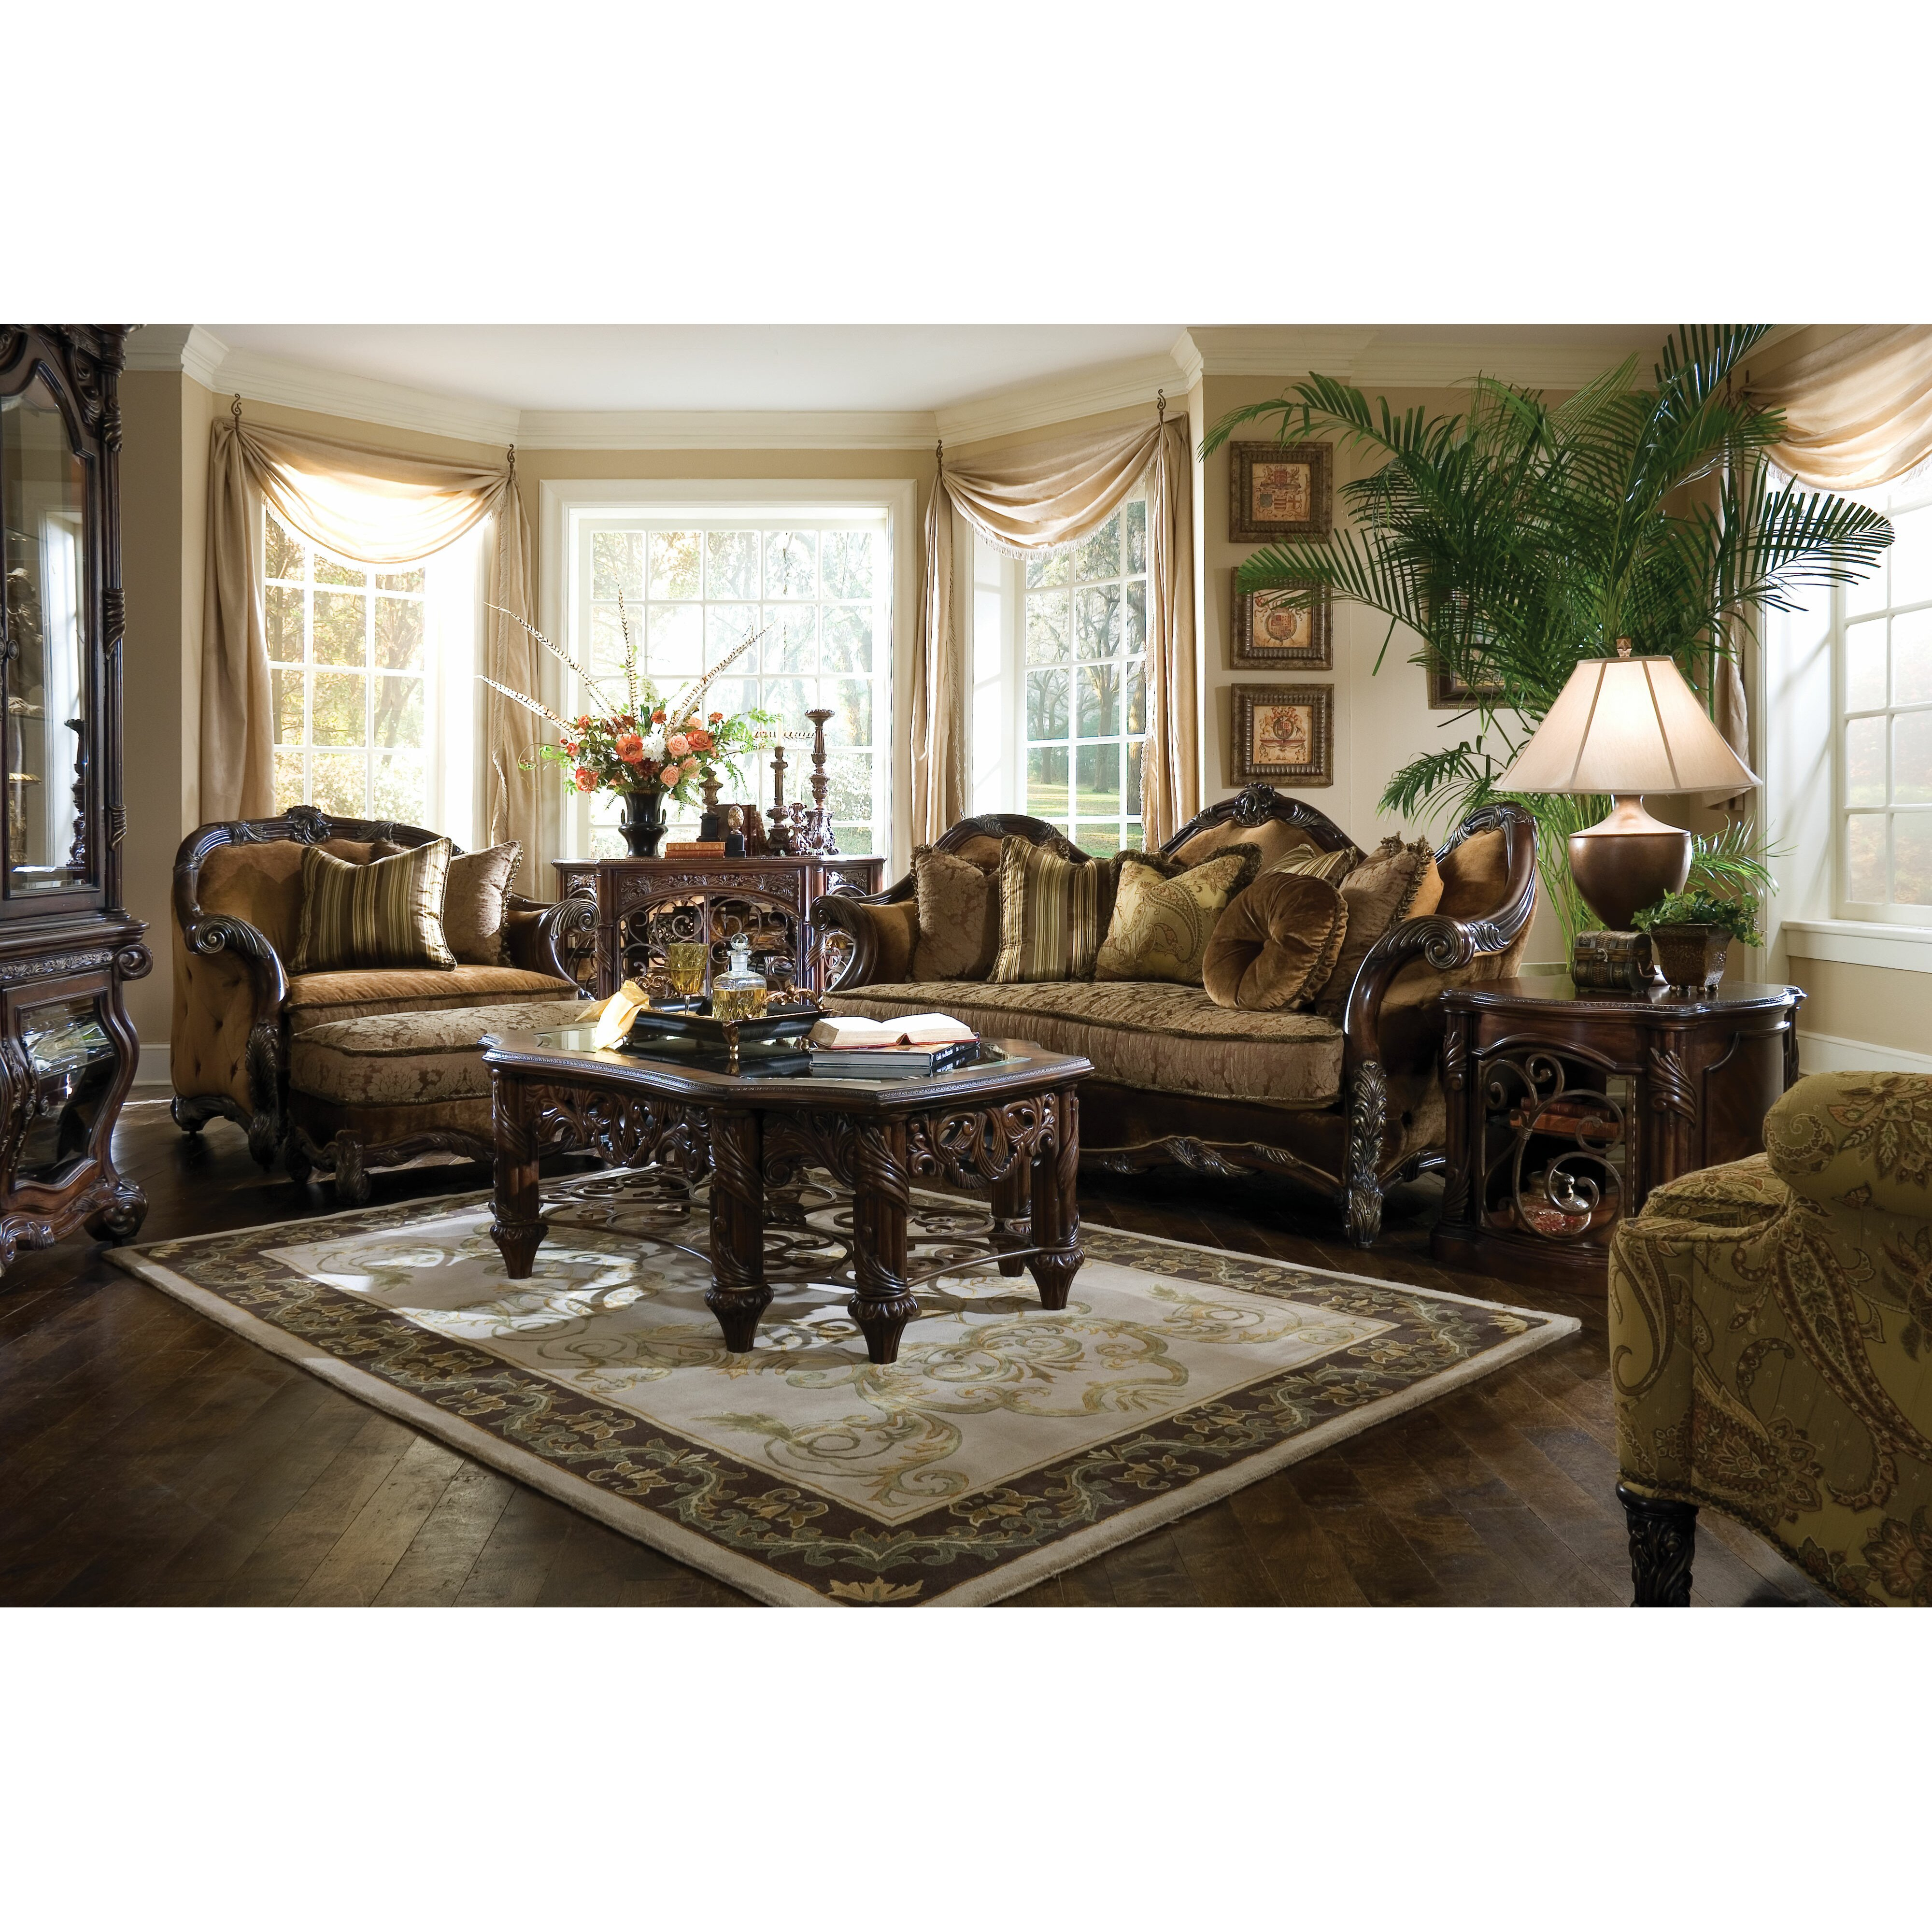 Michael Amini Living Room Furniture Michael Amini Essex Manor Living Room Collection Reviews Wayfair